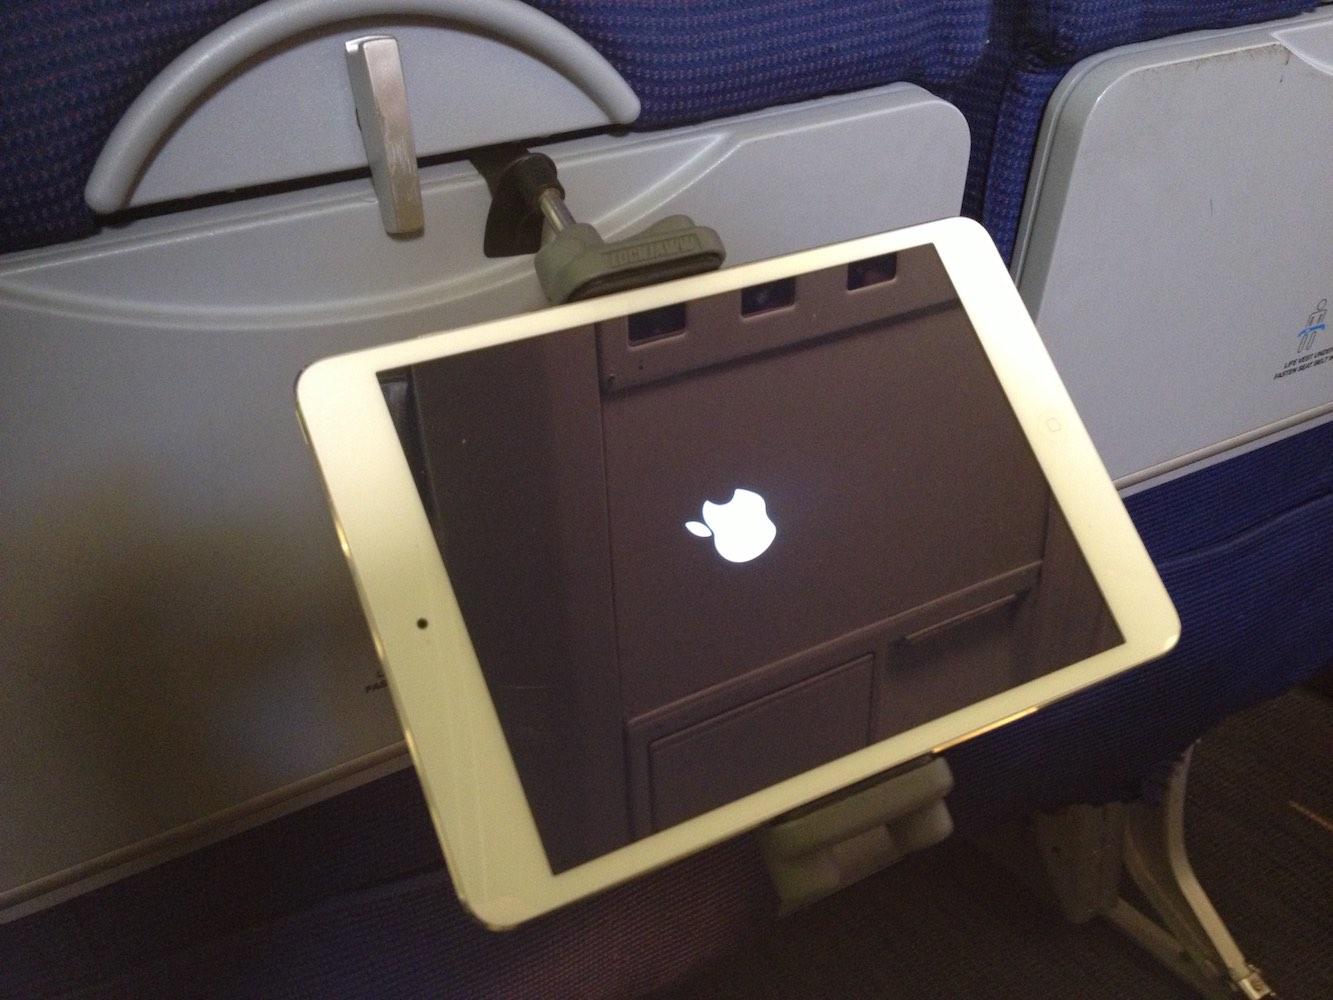 Lockjaww In-flight Mobile Device Holder